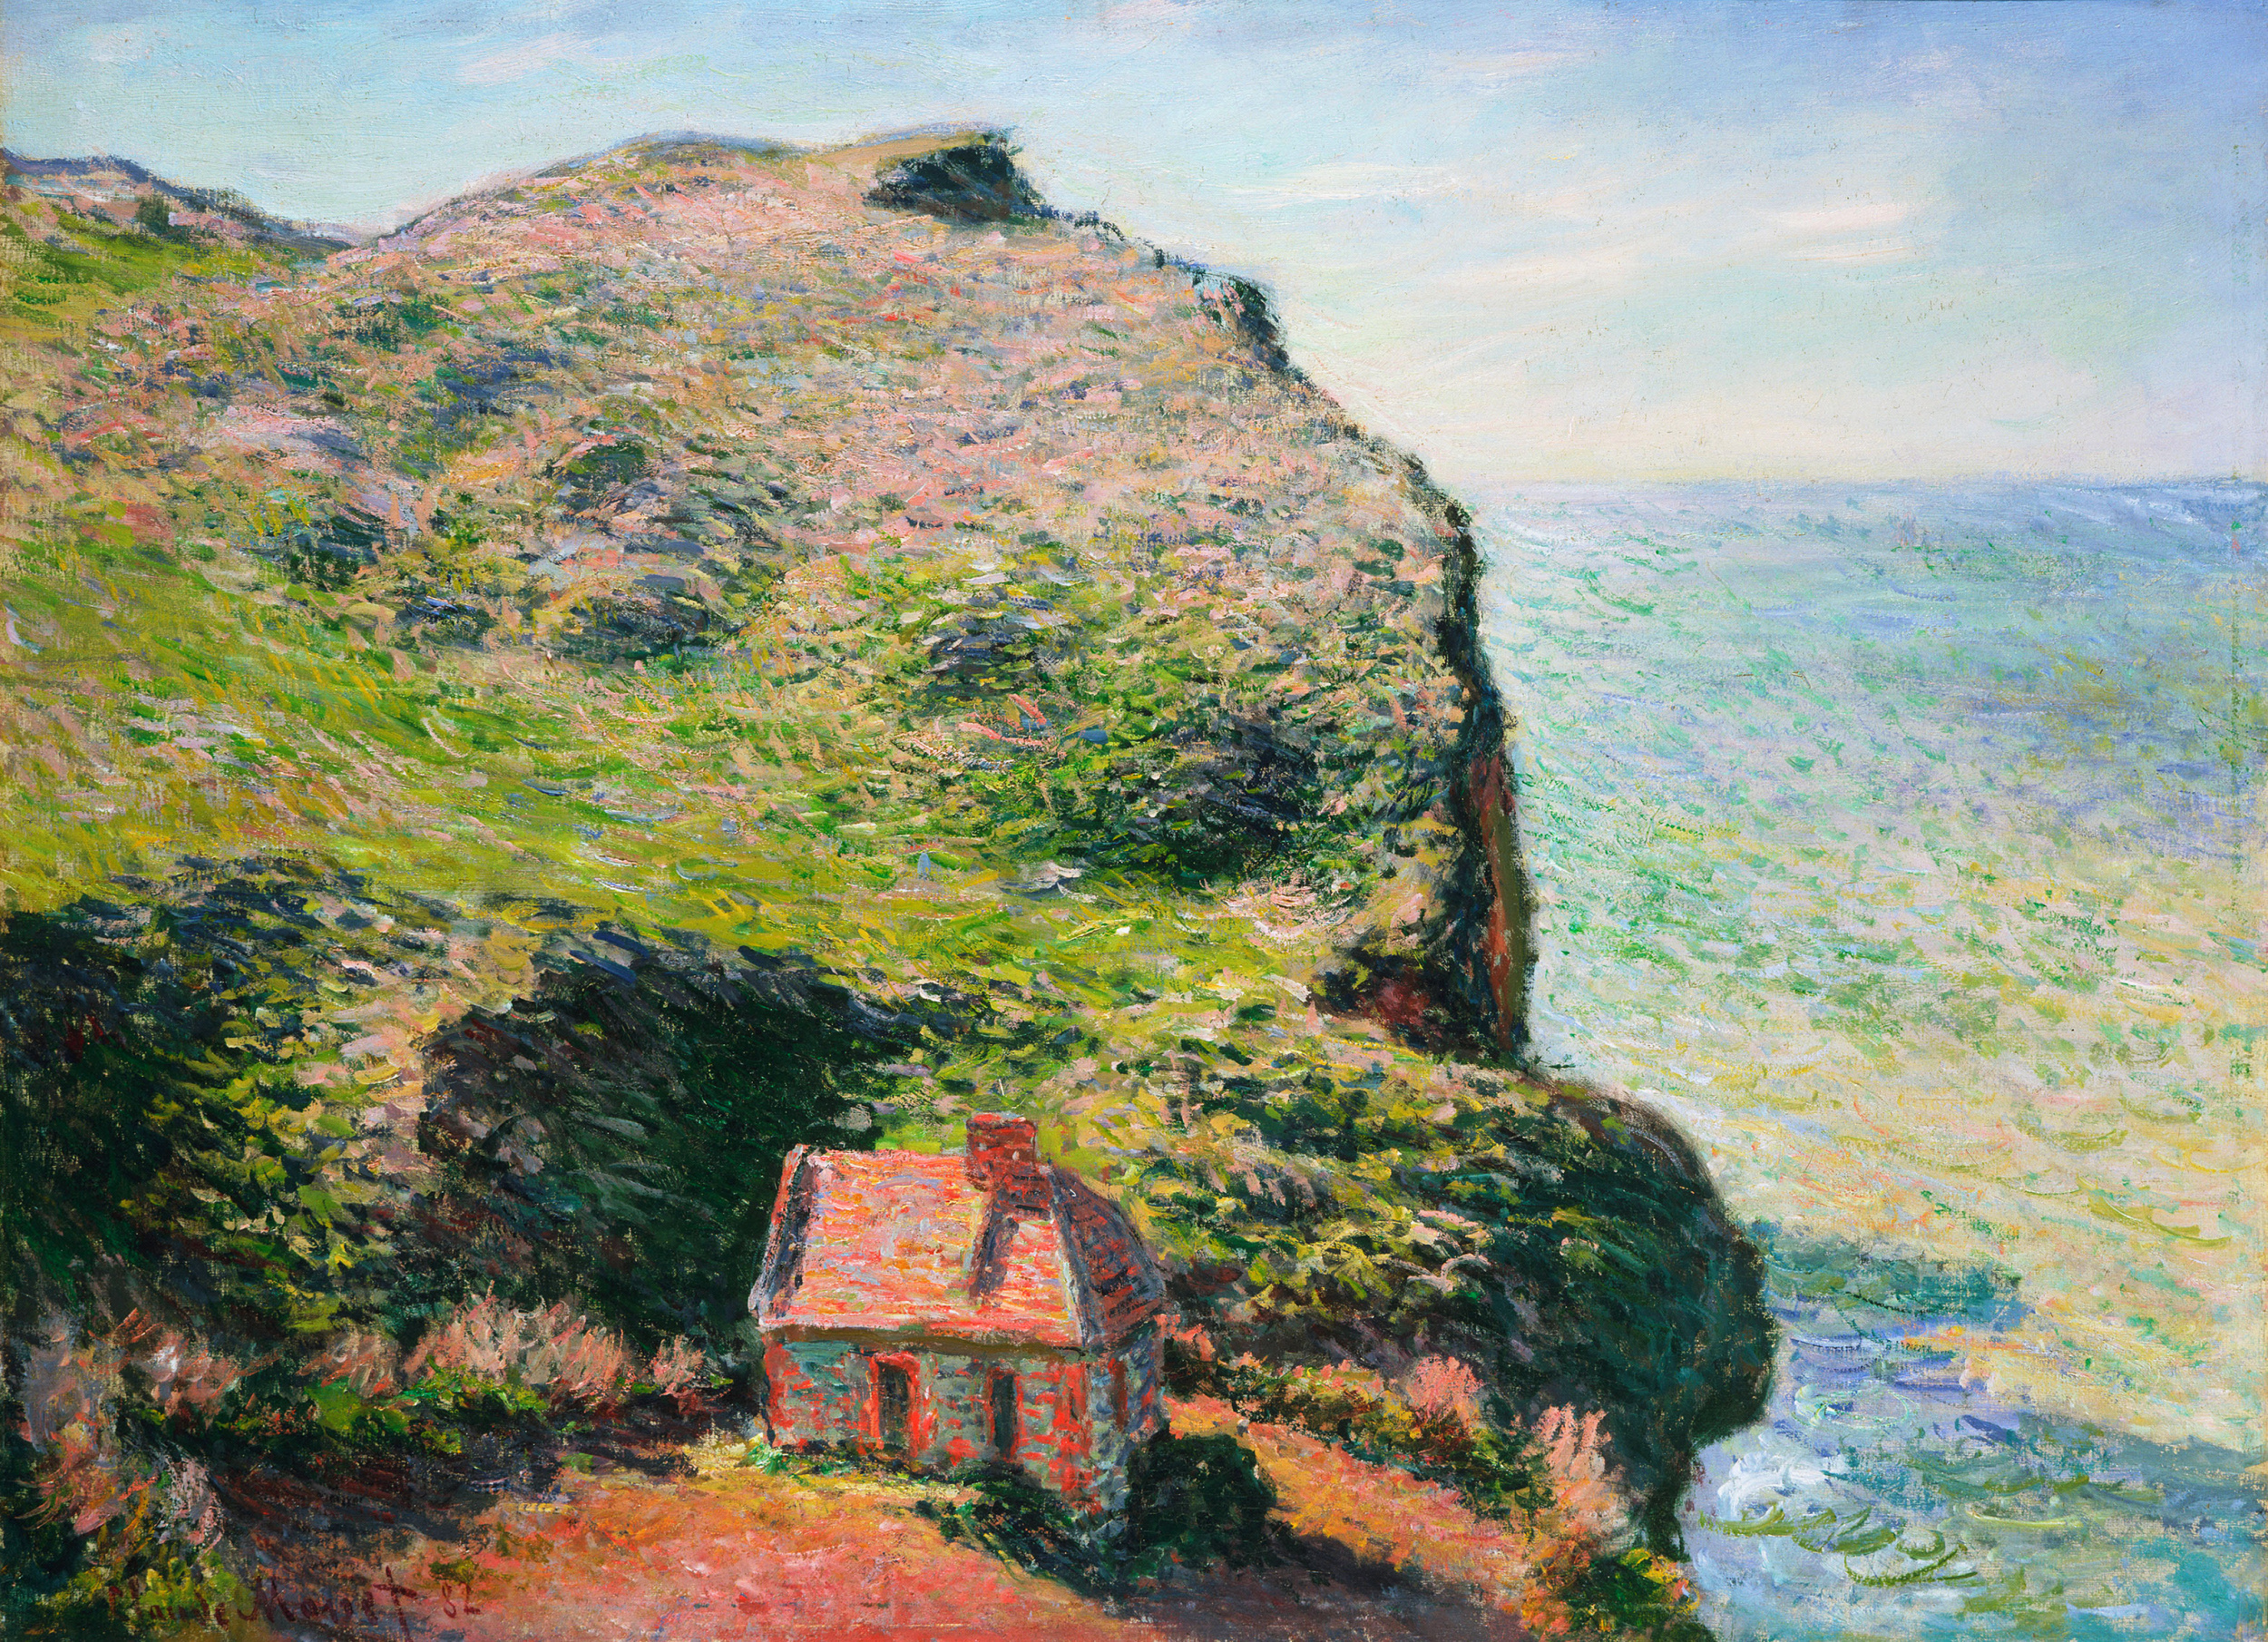 The estaque, 1882 - Pierre-Auguste Renoir - WikiArt.org